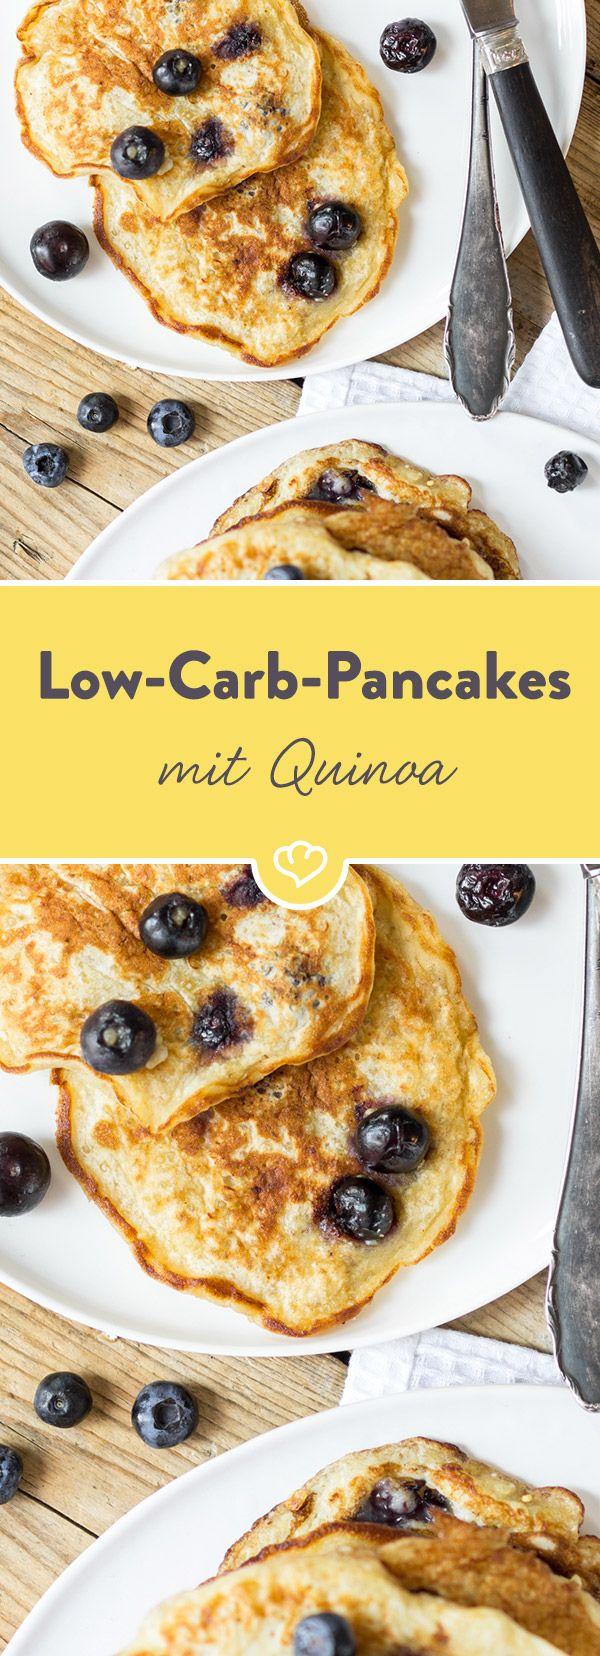 superfood s igkeit low carb pancakes mit quinoa rezept breakfast pinterest quinoa. Black Bedroom Furniture Sets. Home Design Ideas